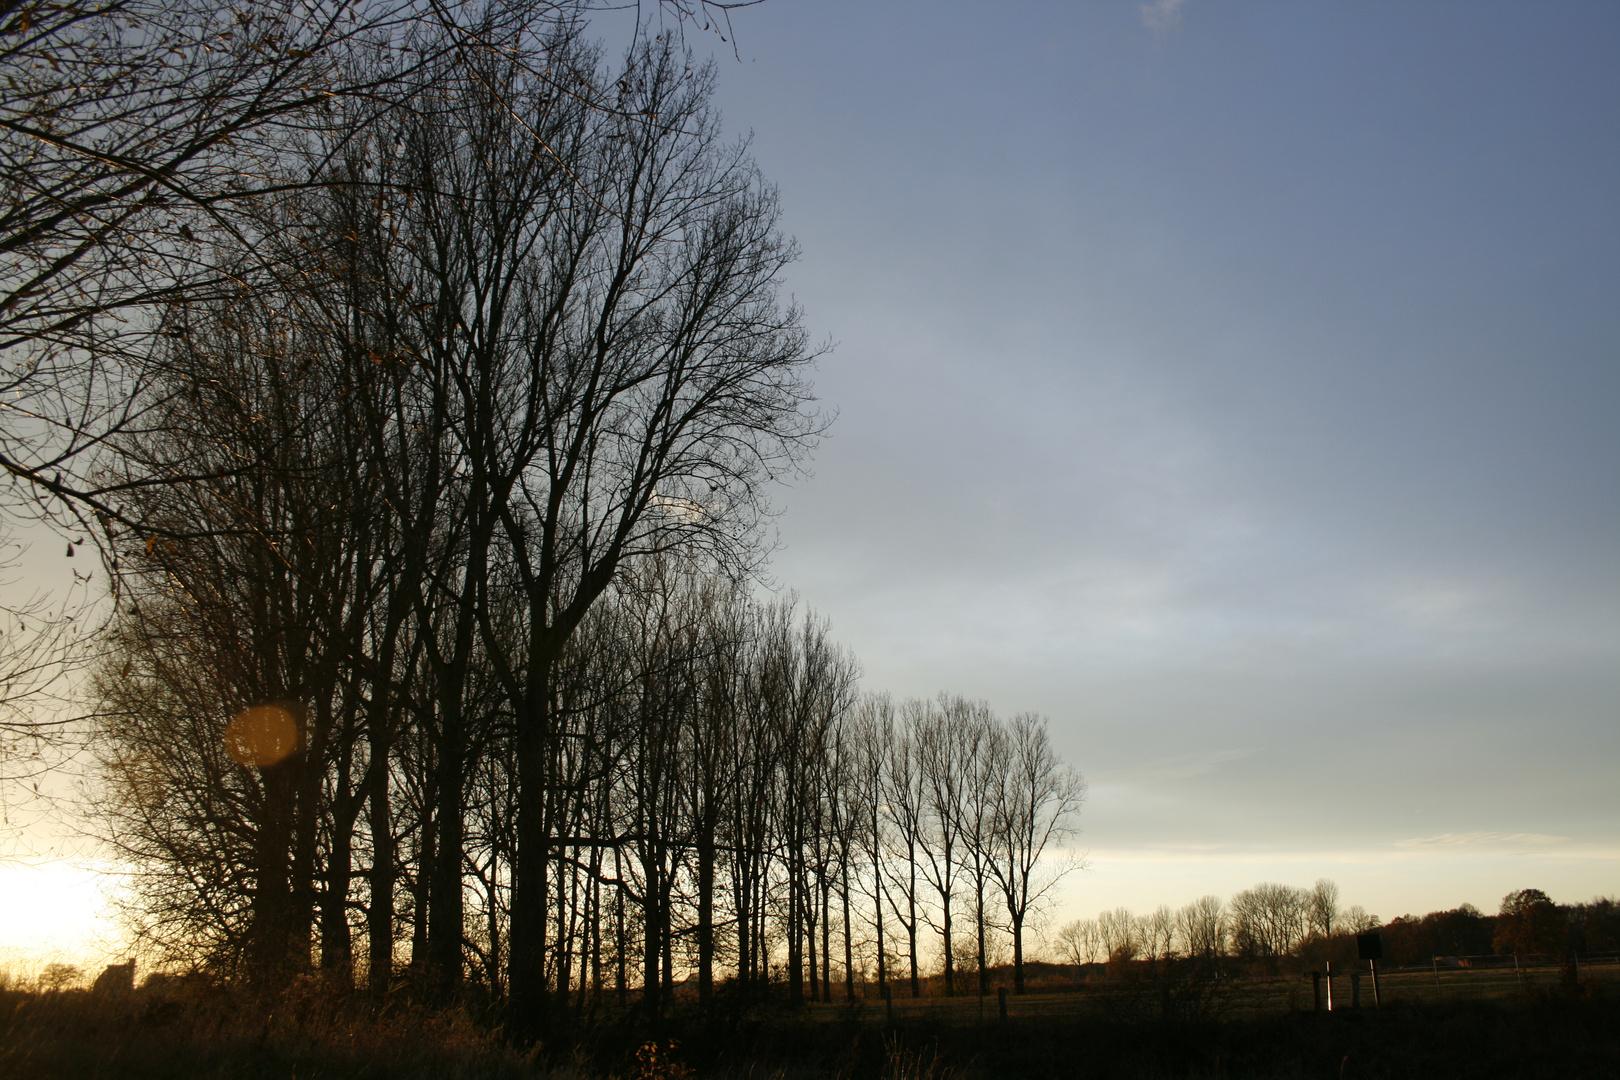 Bäume in Abendsonne